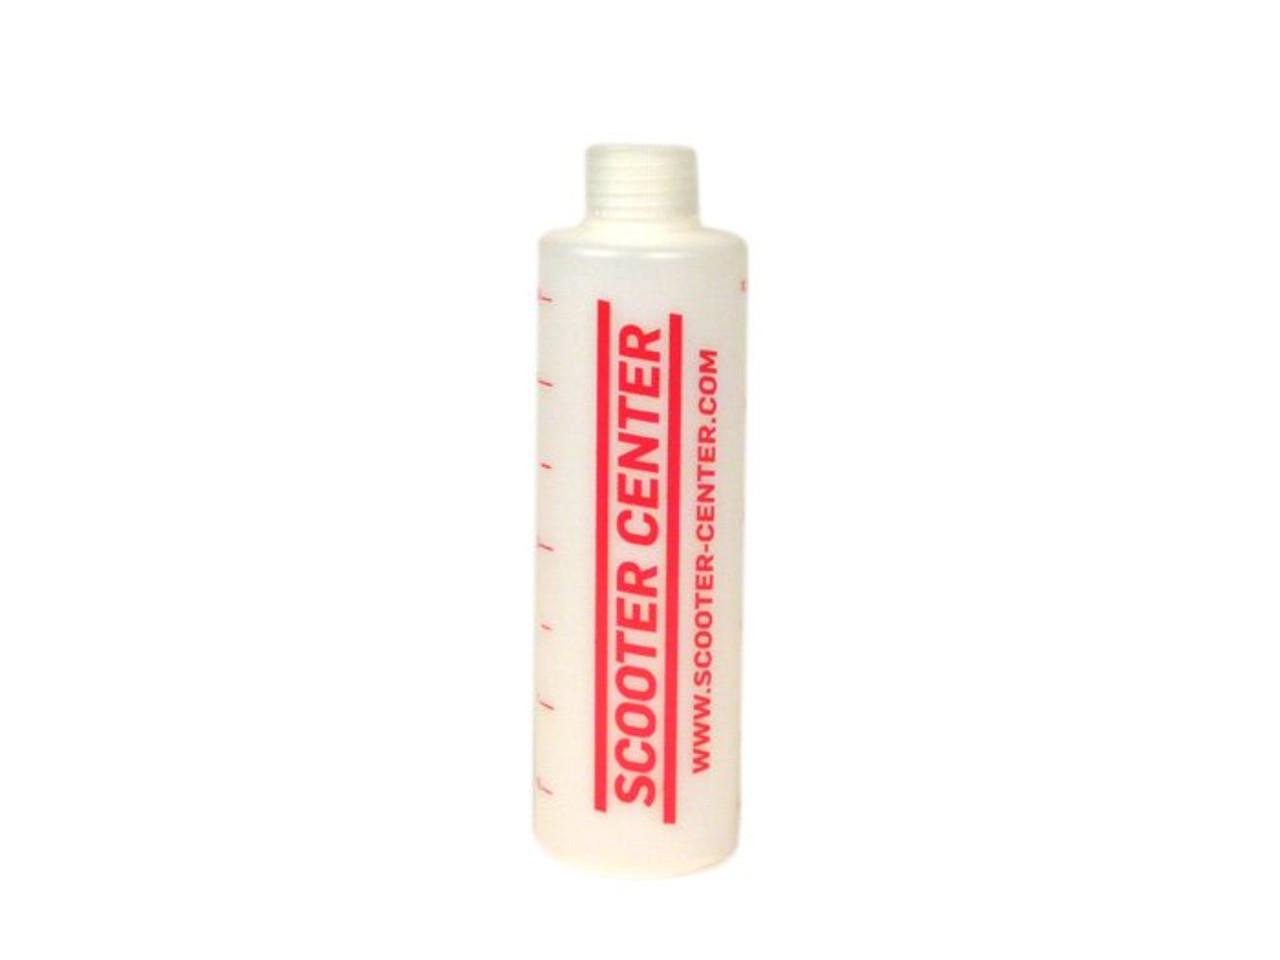 Universal Vespa Lambretta Oil Measuring Bottle SCK (OIL-7670767)